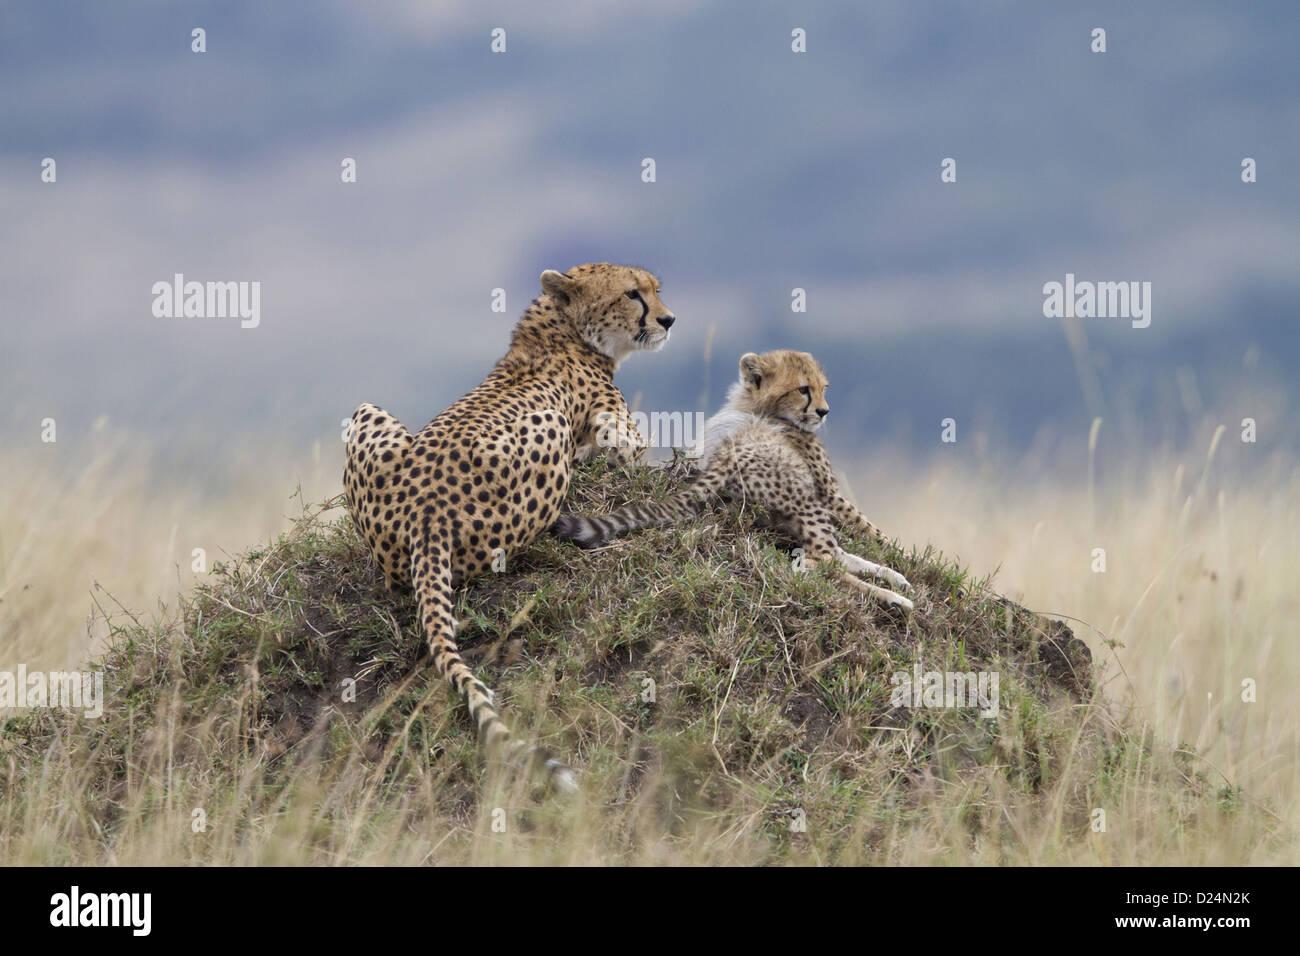 Cheetah (Acinonyx jubatus) adult female with cub, resting on termite mound, Masai Mara, Kenya, August Stock Photo